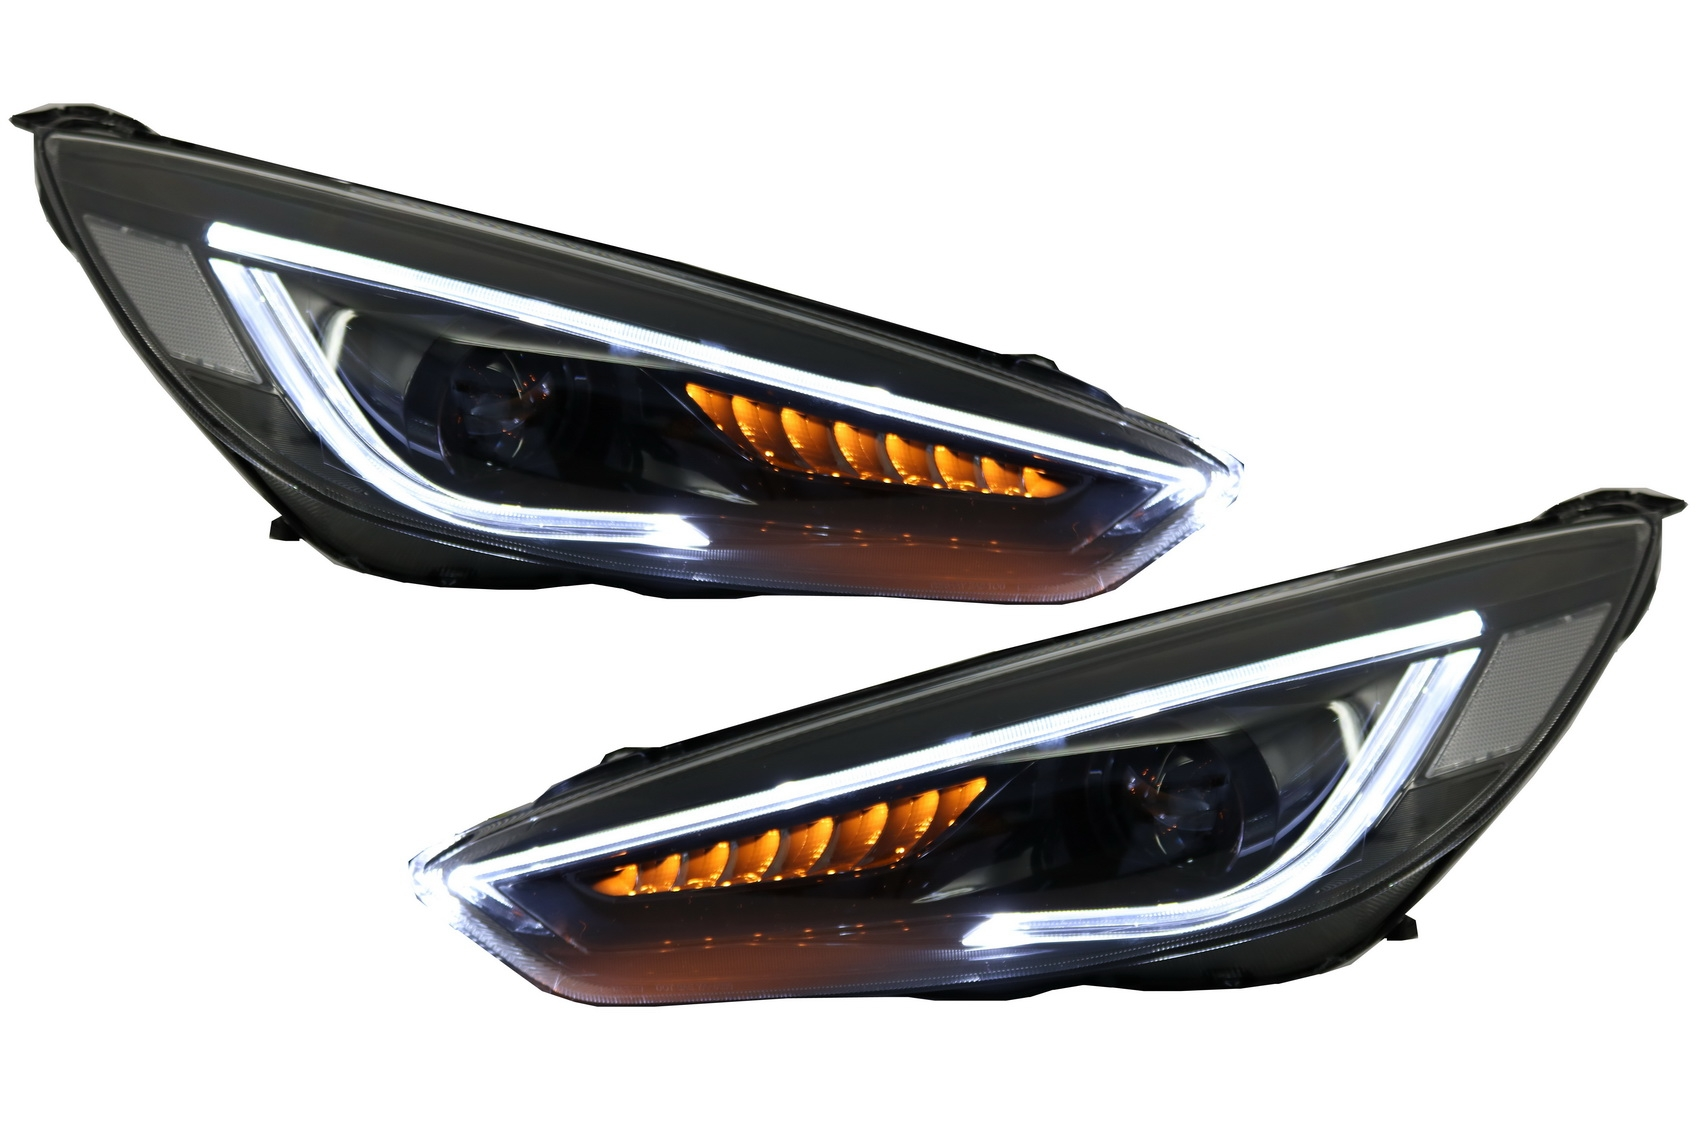 headlights led drl for ford focus iii mk3 15 17 bi xenon look dynamic flowing ebay. Black Bedroom Furniture Sets. Home Design Ideas